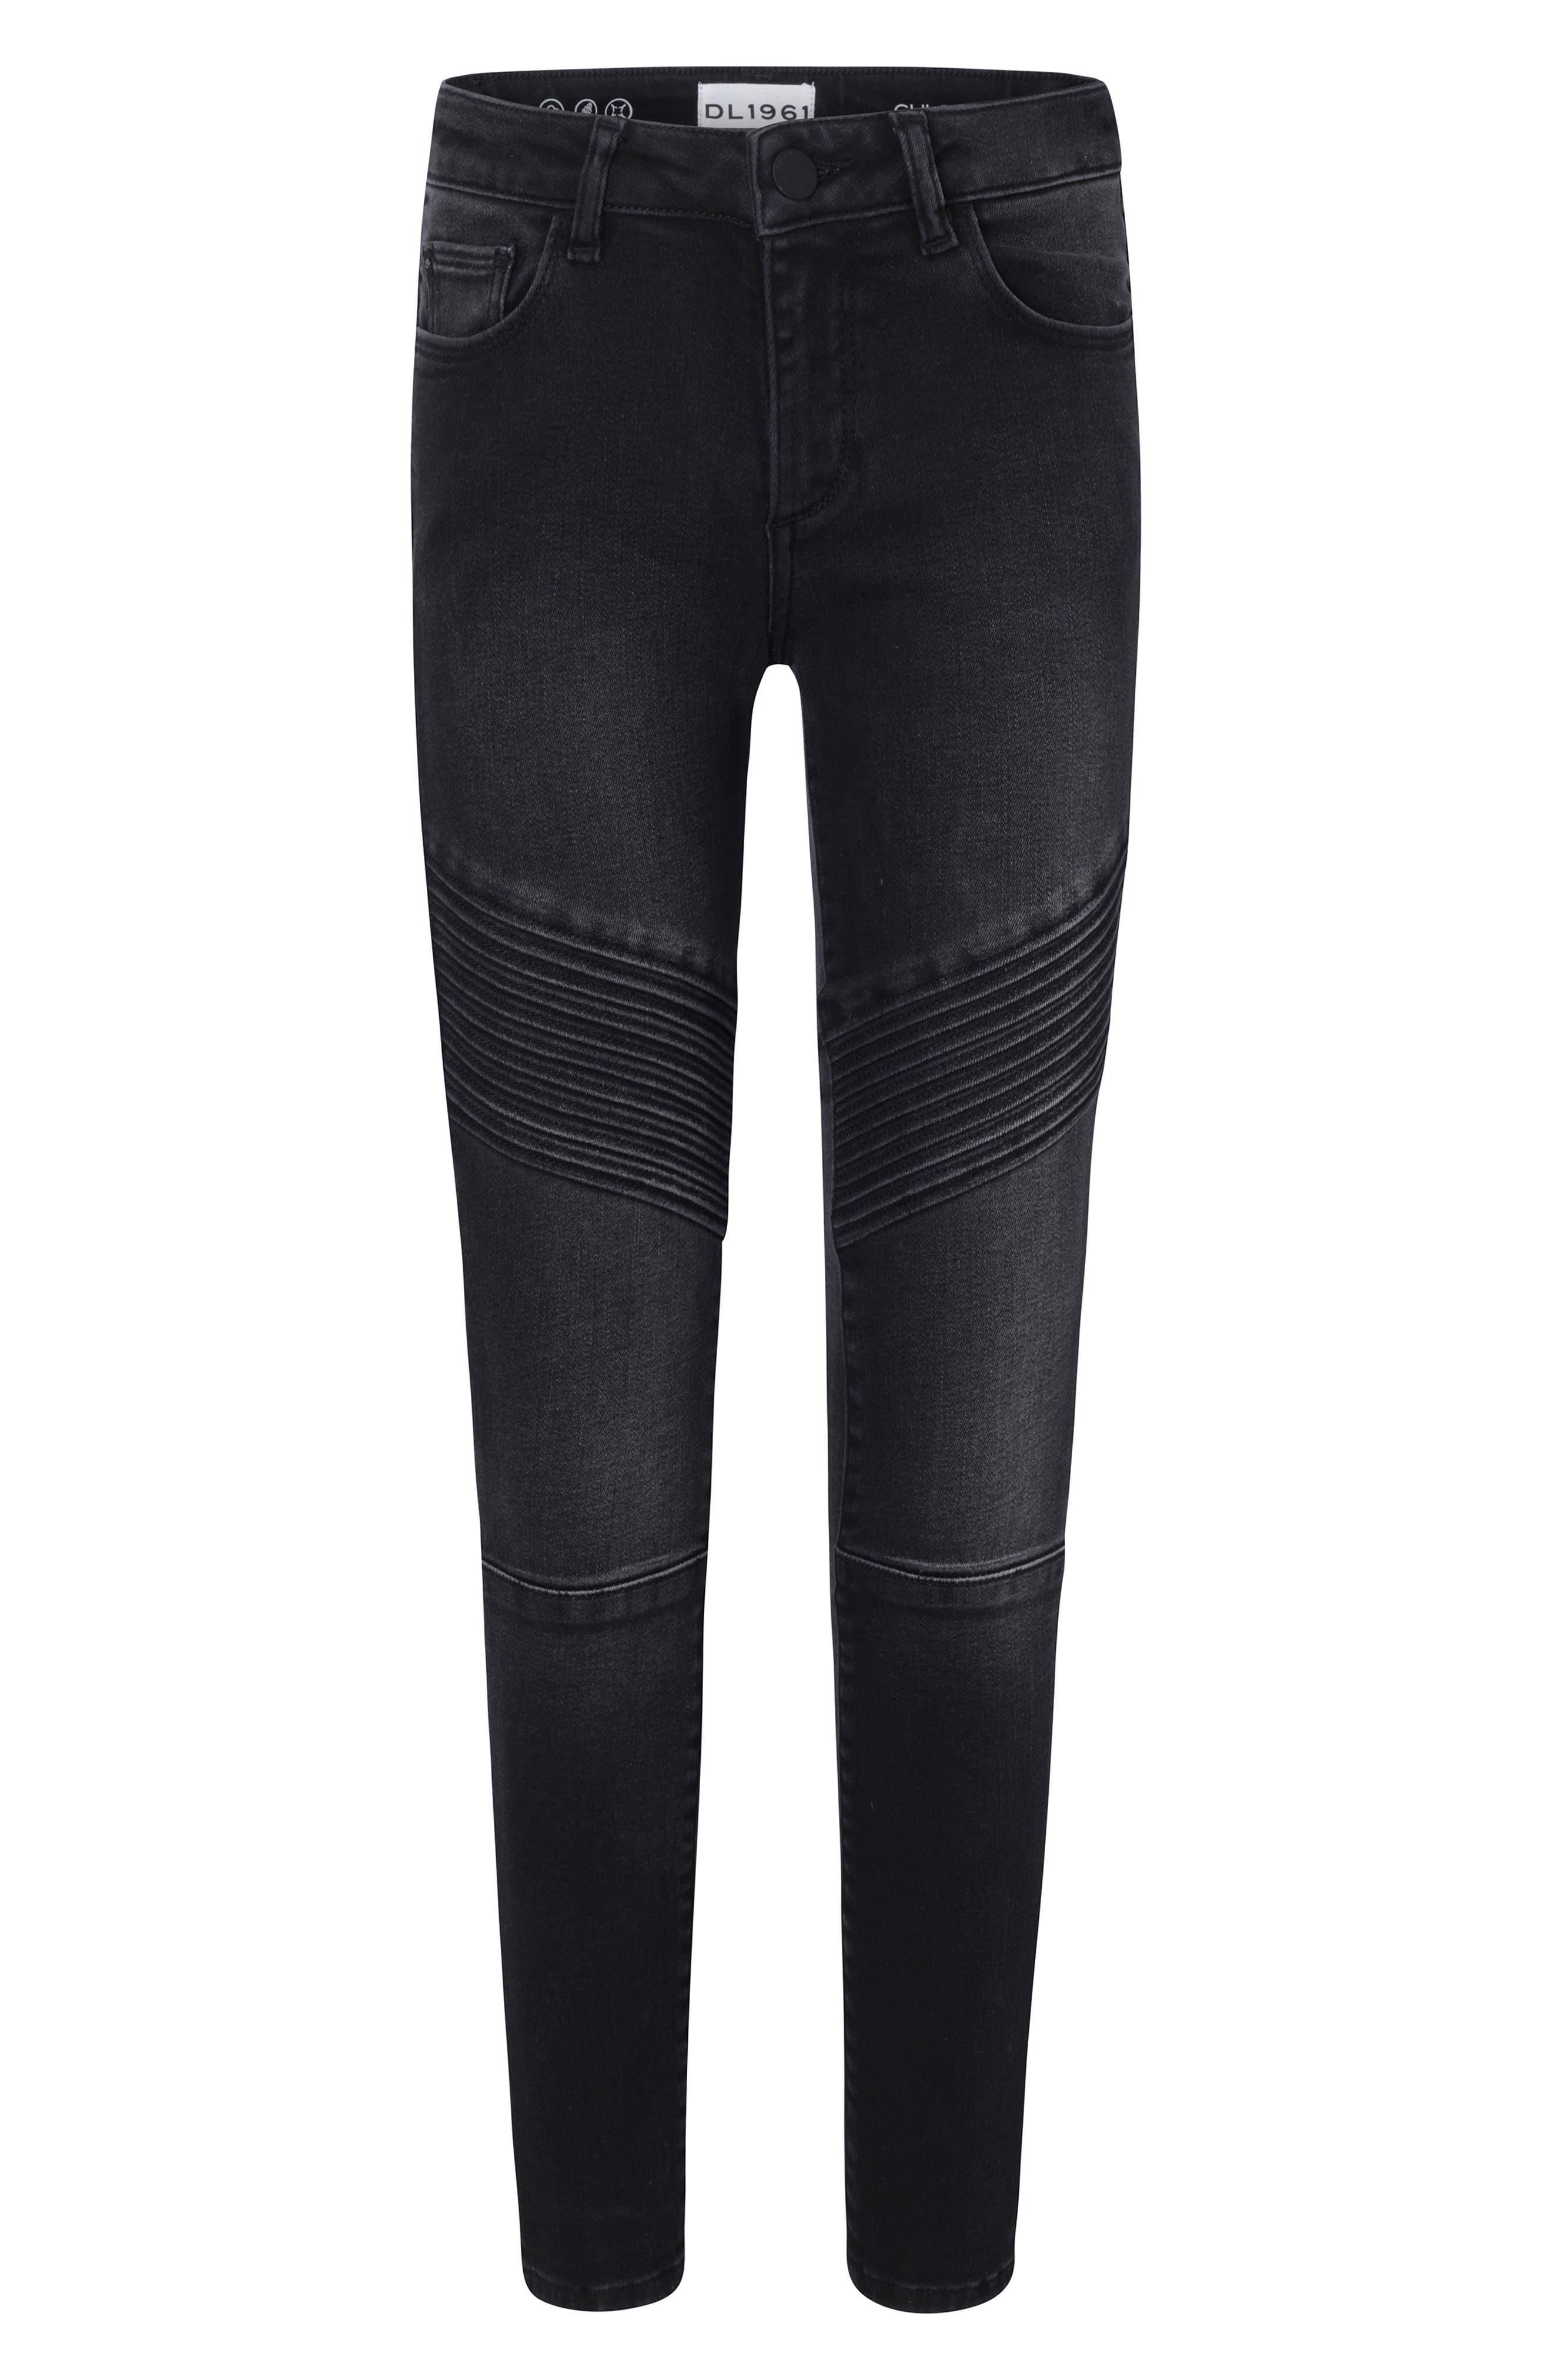 Chloe Moto Skinny Jeans,                         Main,                         color, DUTCH